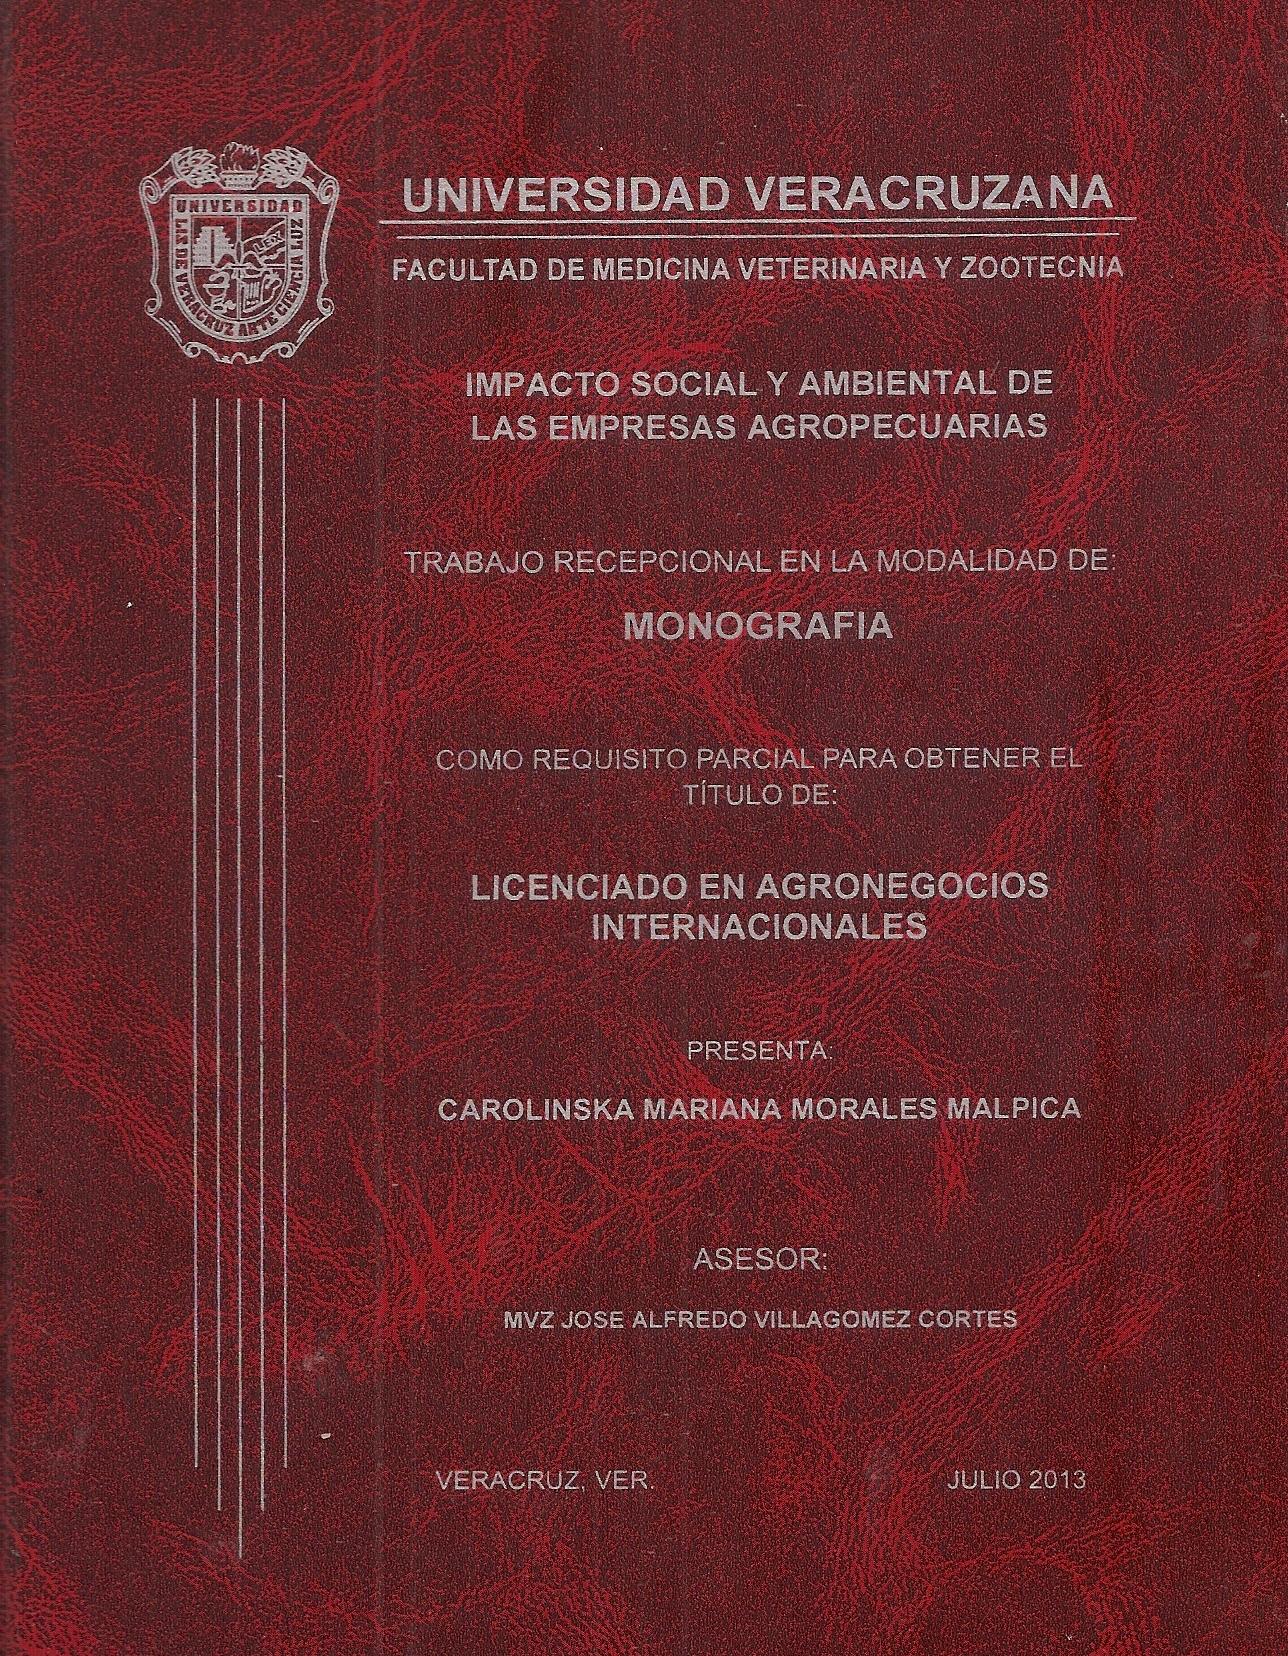 http cdigital uv mx bitstream 123456789 33702 1 moralesmalpica pdf